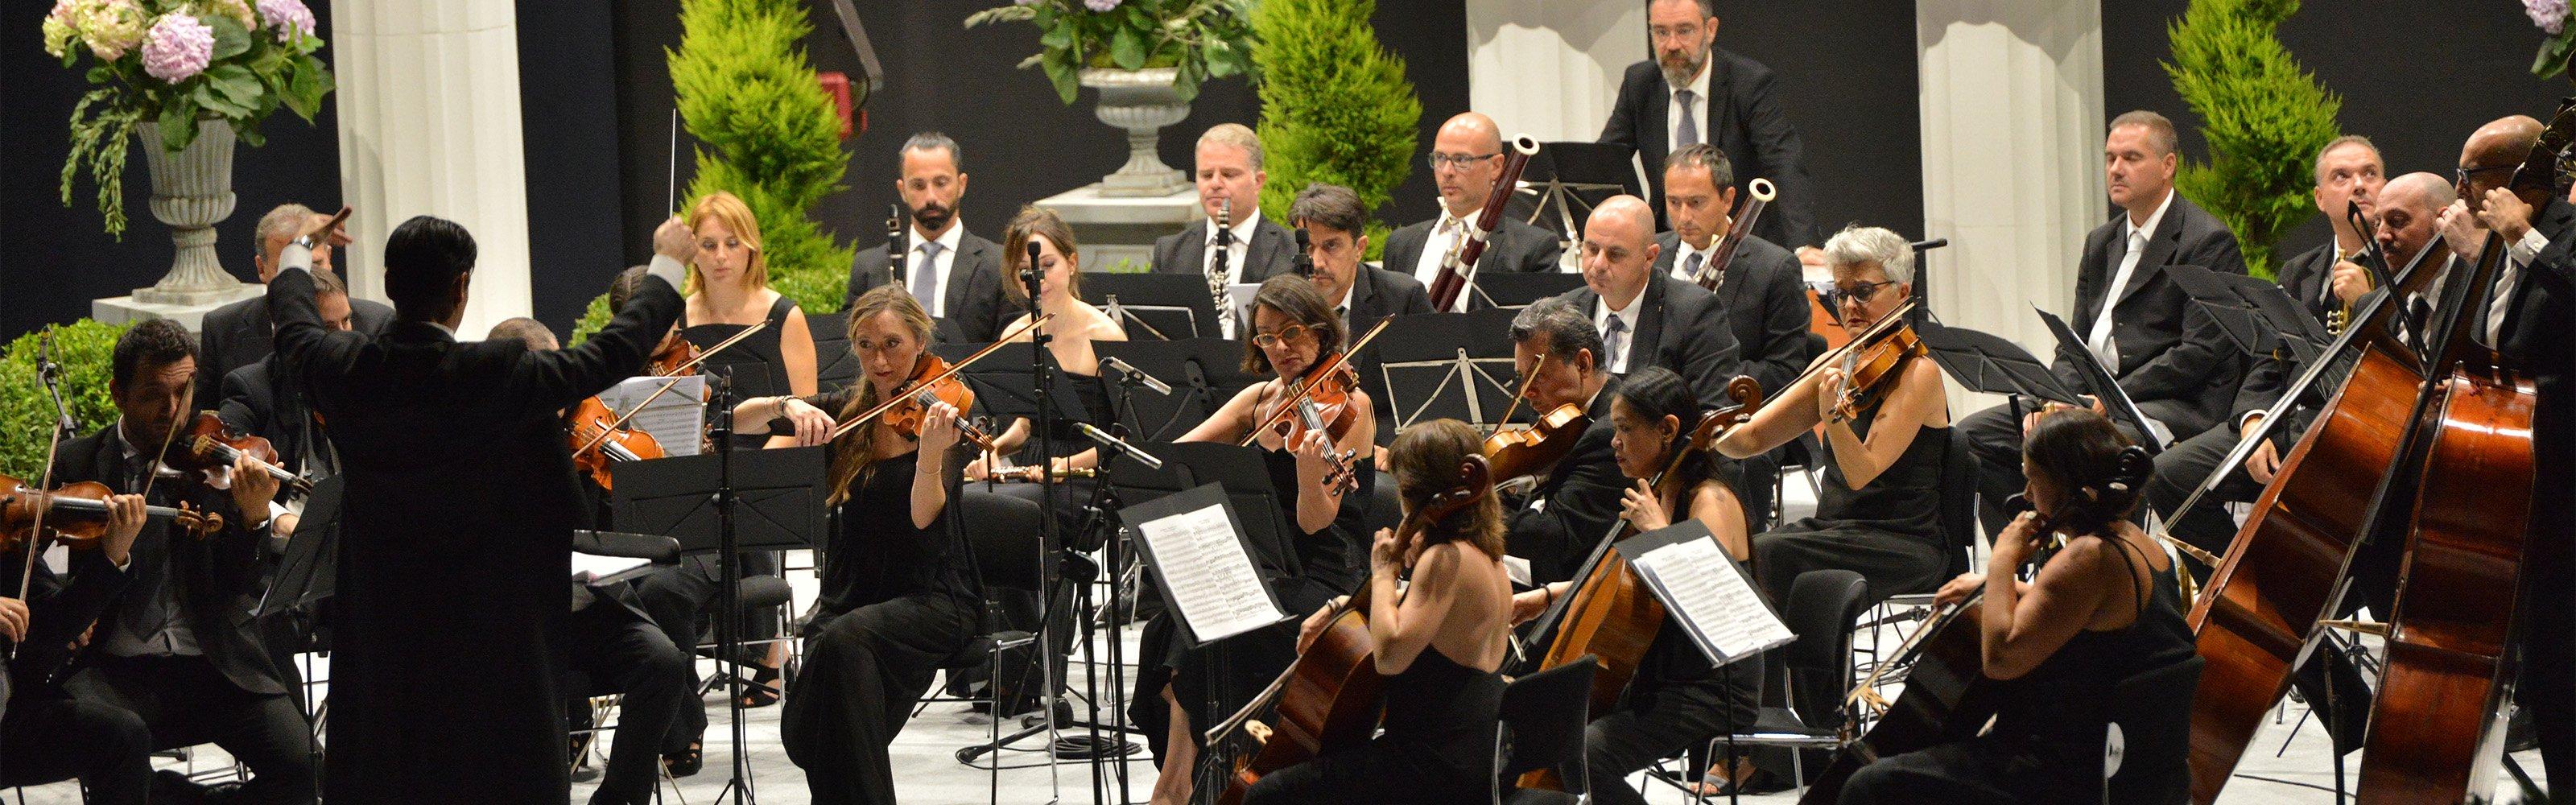 Rome Symphony Orchestra 5